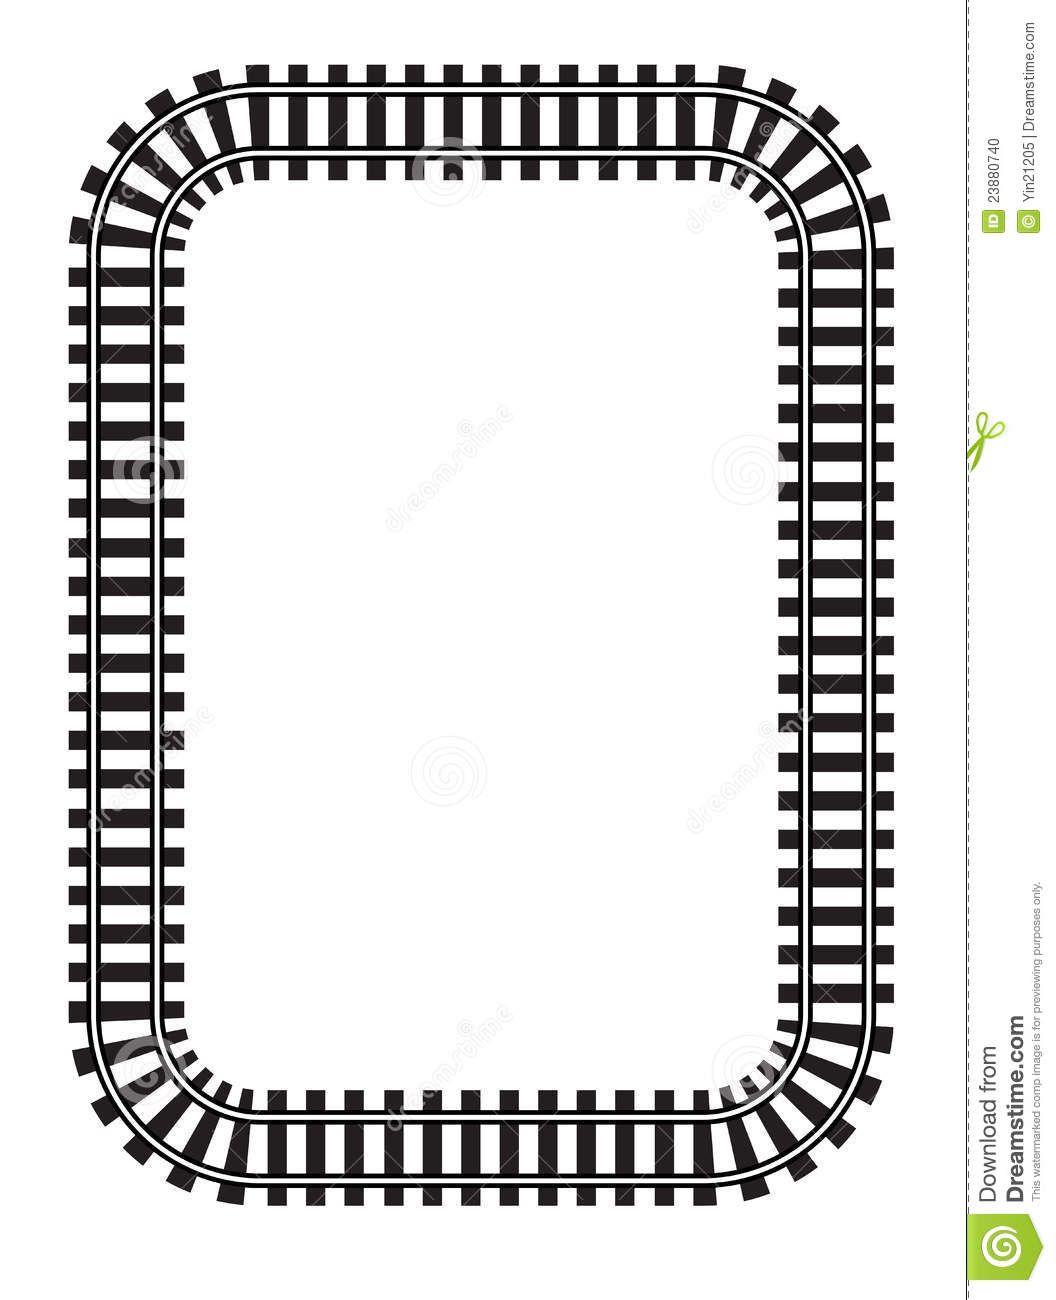 medium resolution of train track clipart google search